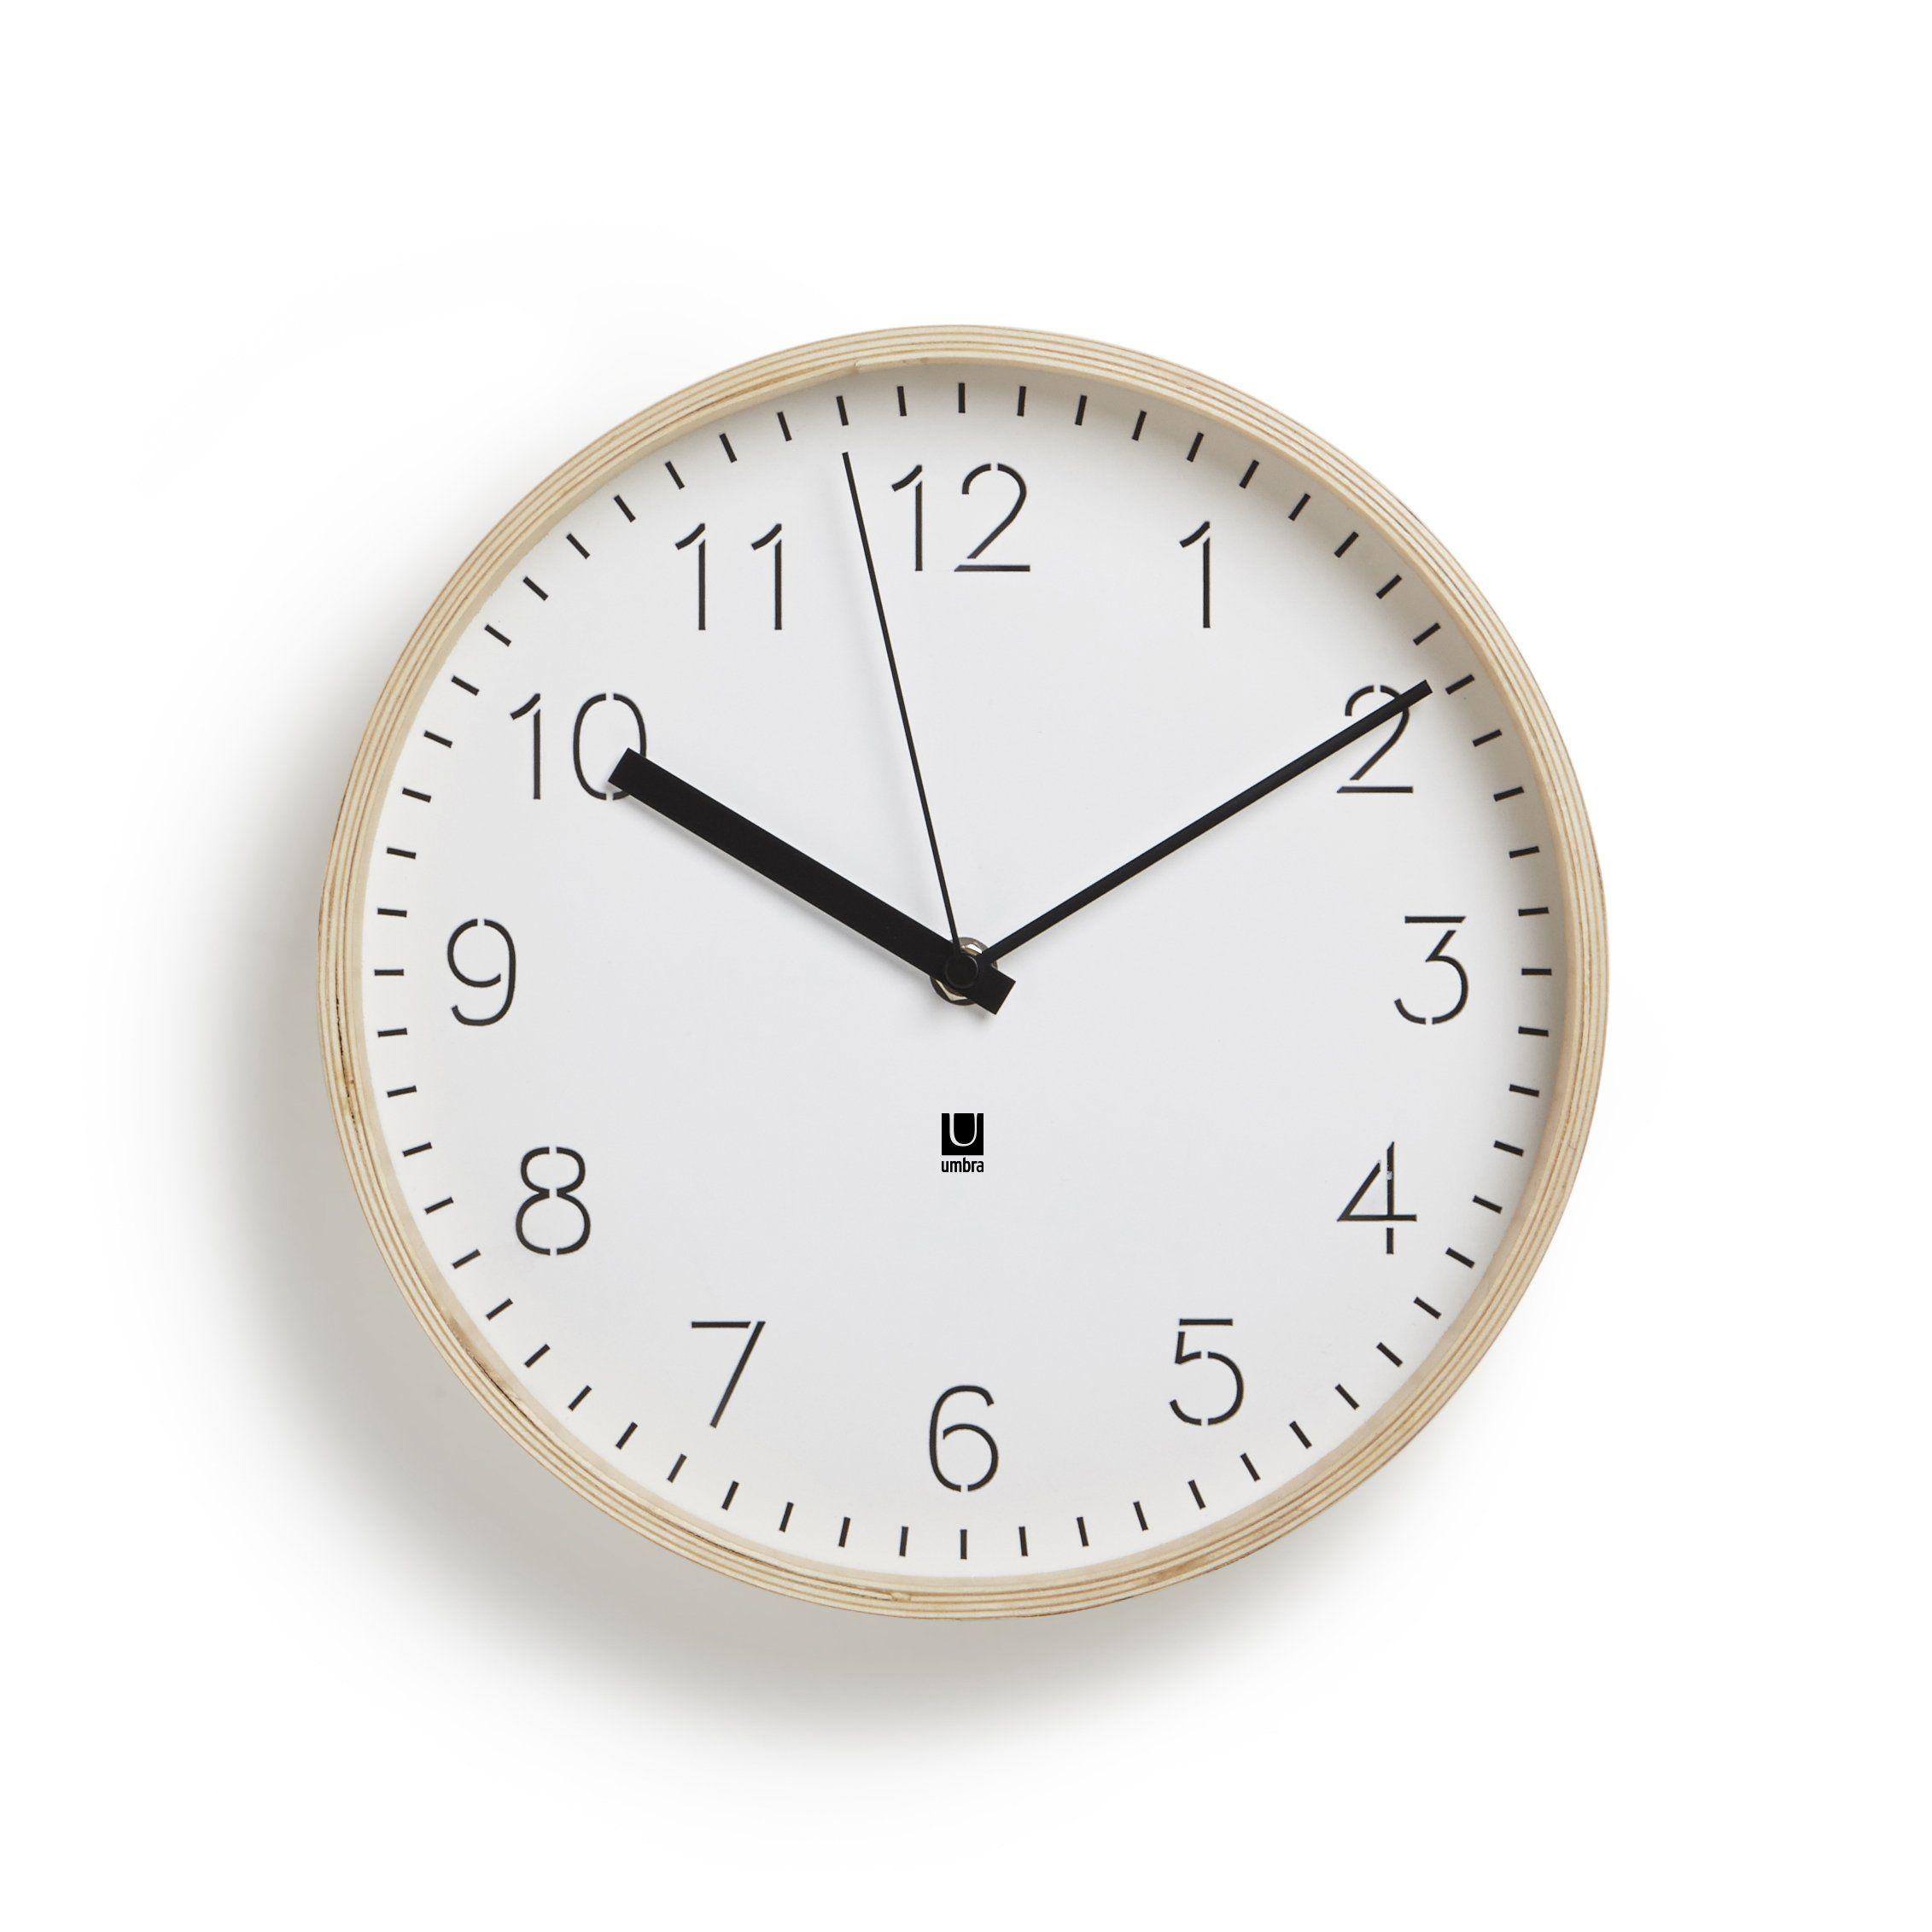 Umbra Rimwood Wall Clock Decorative Wooden Wall Clock Made From Natural Wood Doubles As Wall Decor W Wall Clock Scandinavian Clocks Contemporary Wall Clock